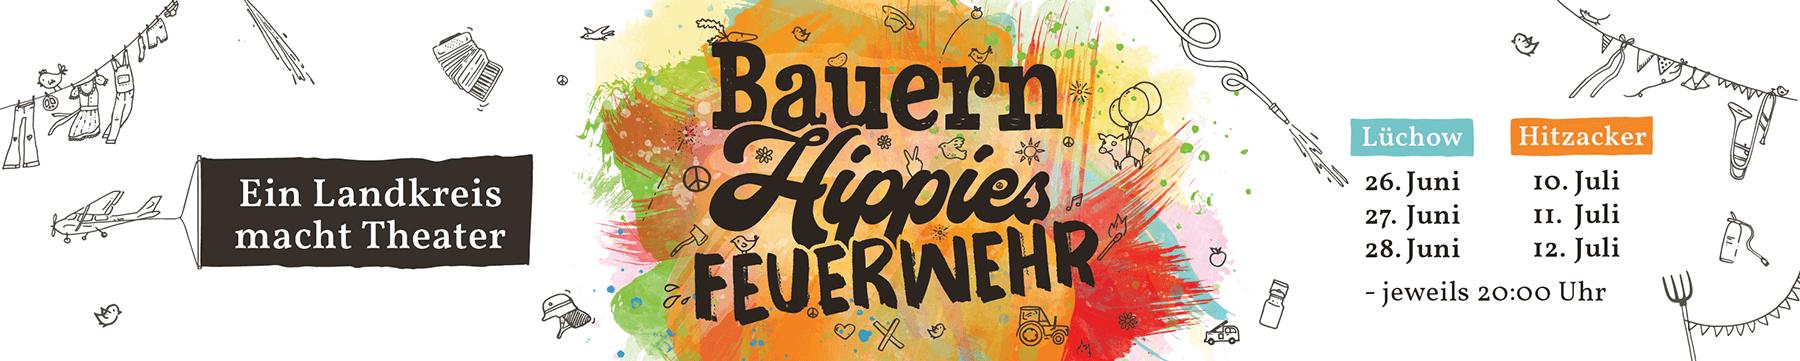 BauHipFeu-header_1800_rgb